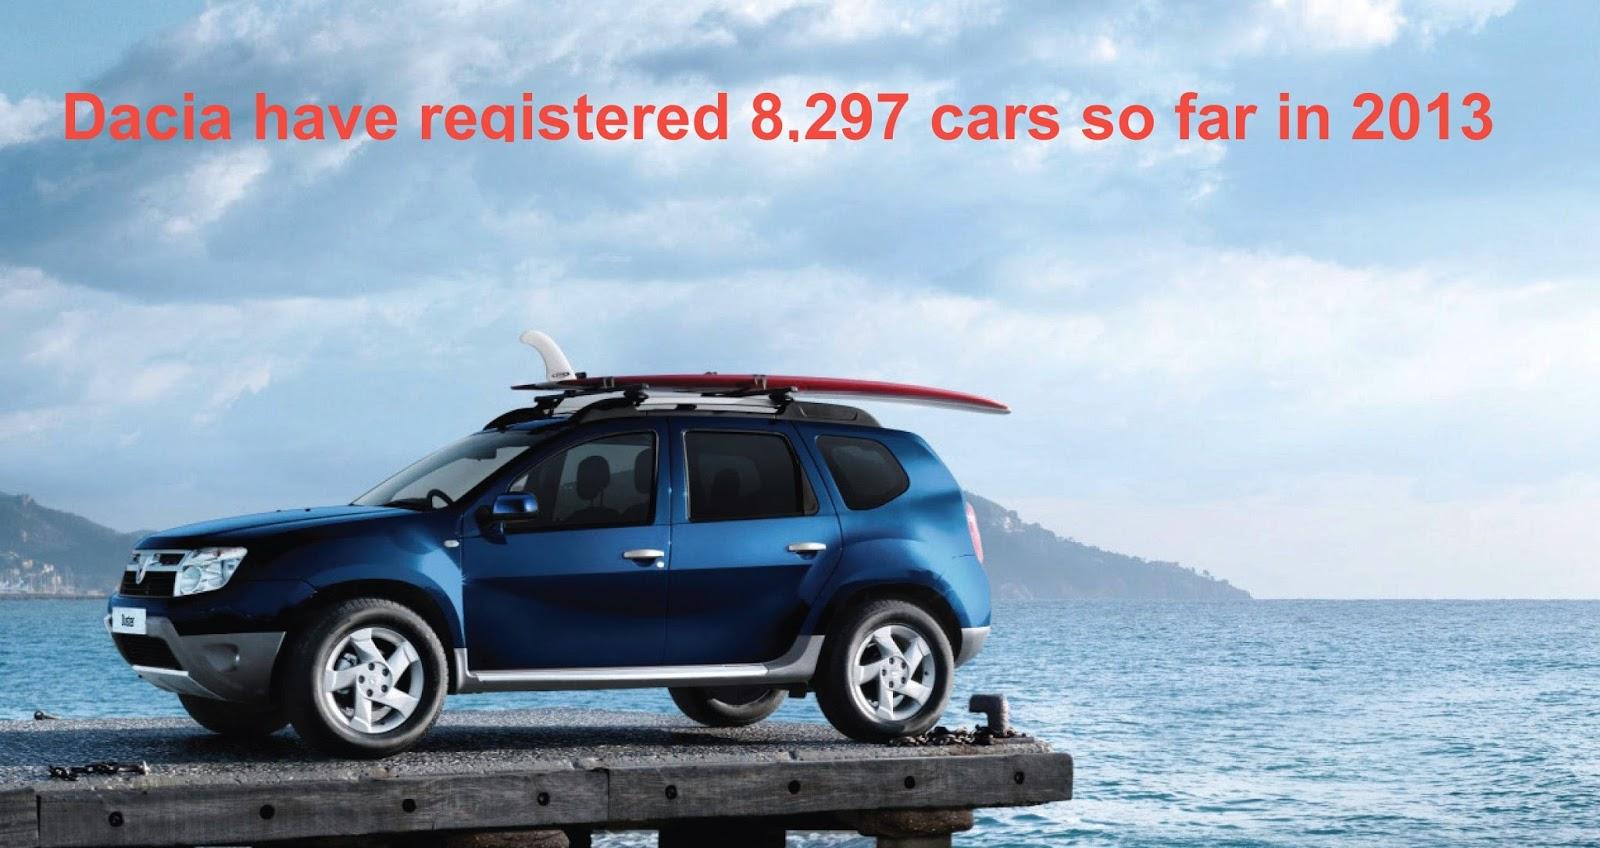 Enterprise Car Sales Salt Lake City Utah